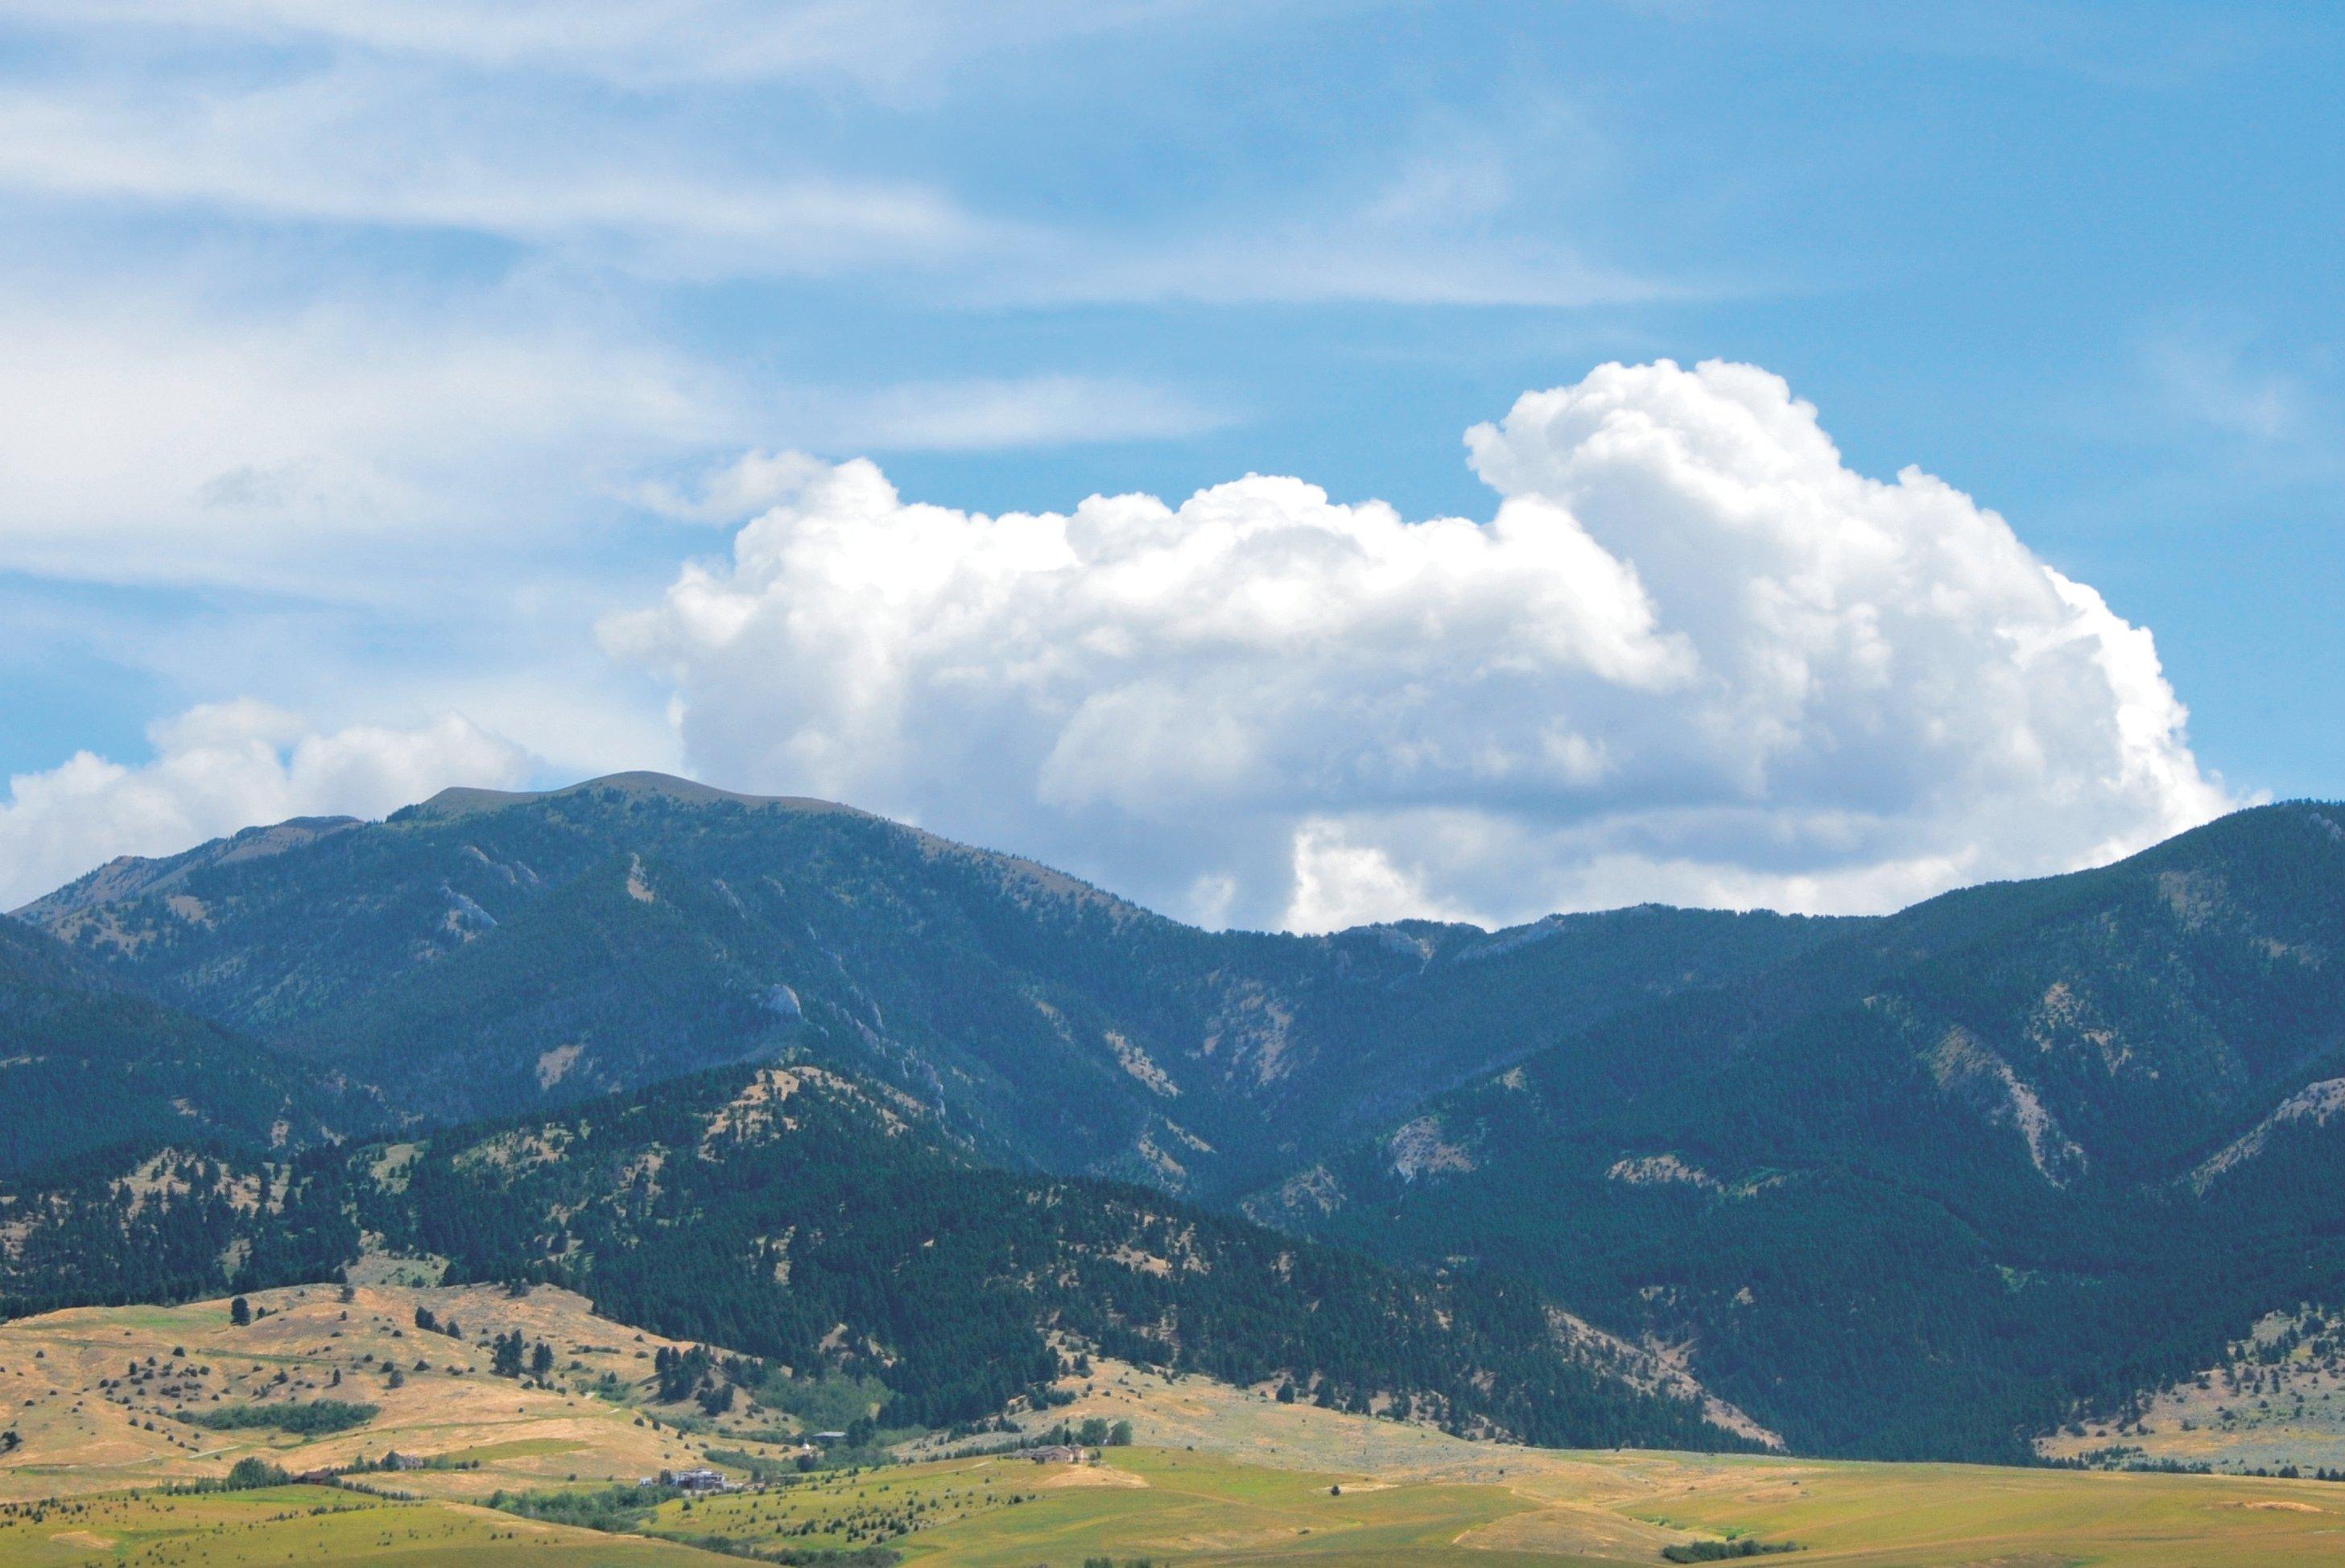 bridger range in bozeman, montana